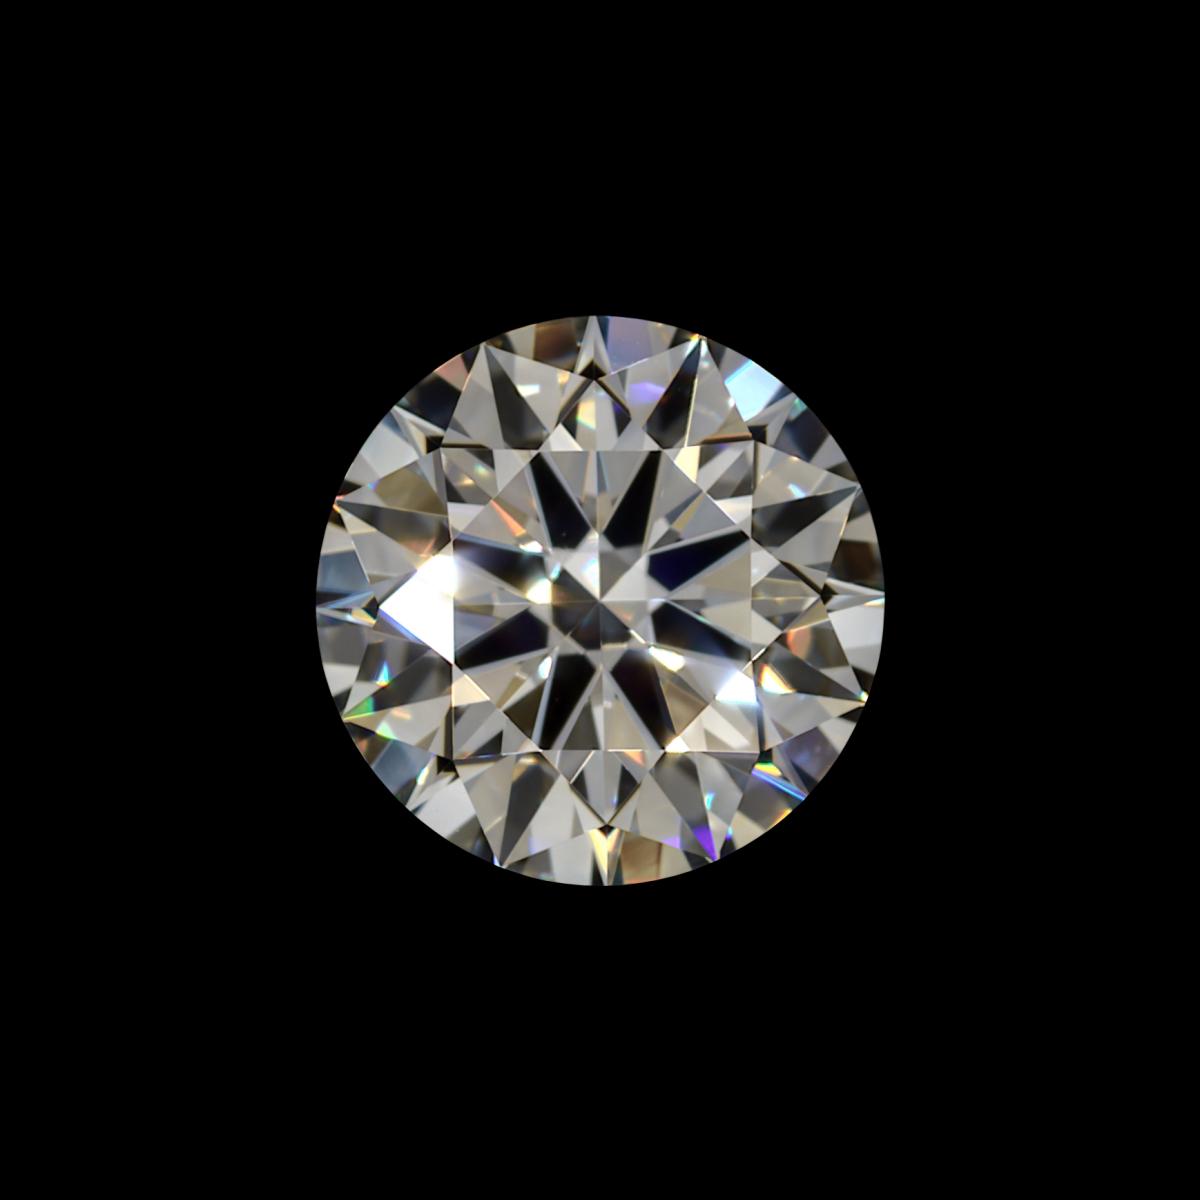 https://cdn.briangavindiamonds.com/files/mp4/CBLAGS-104107226011/CBLAGS-104107226011-Fire-02.mp4